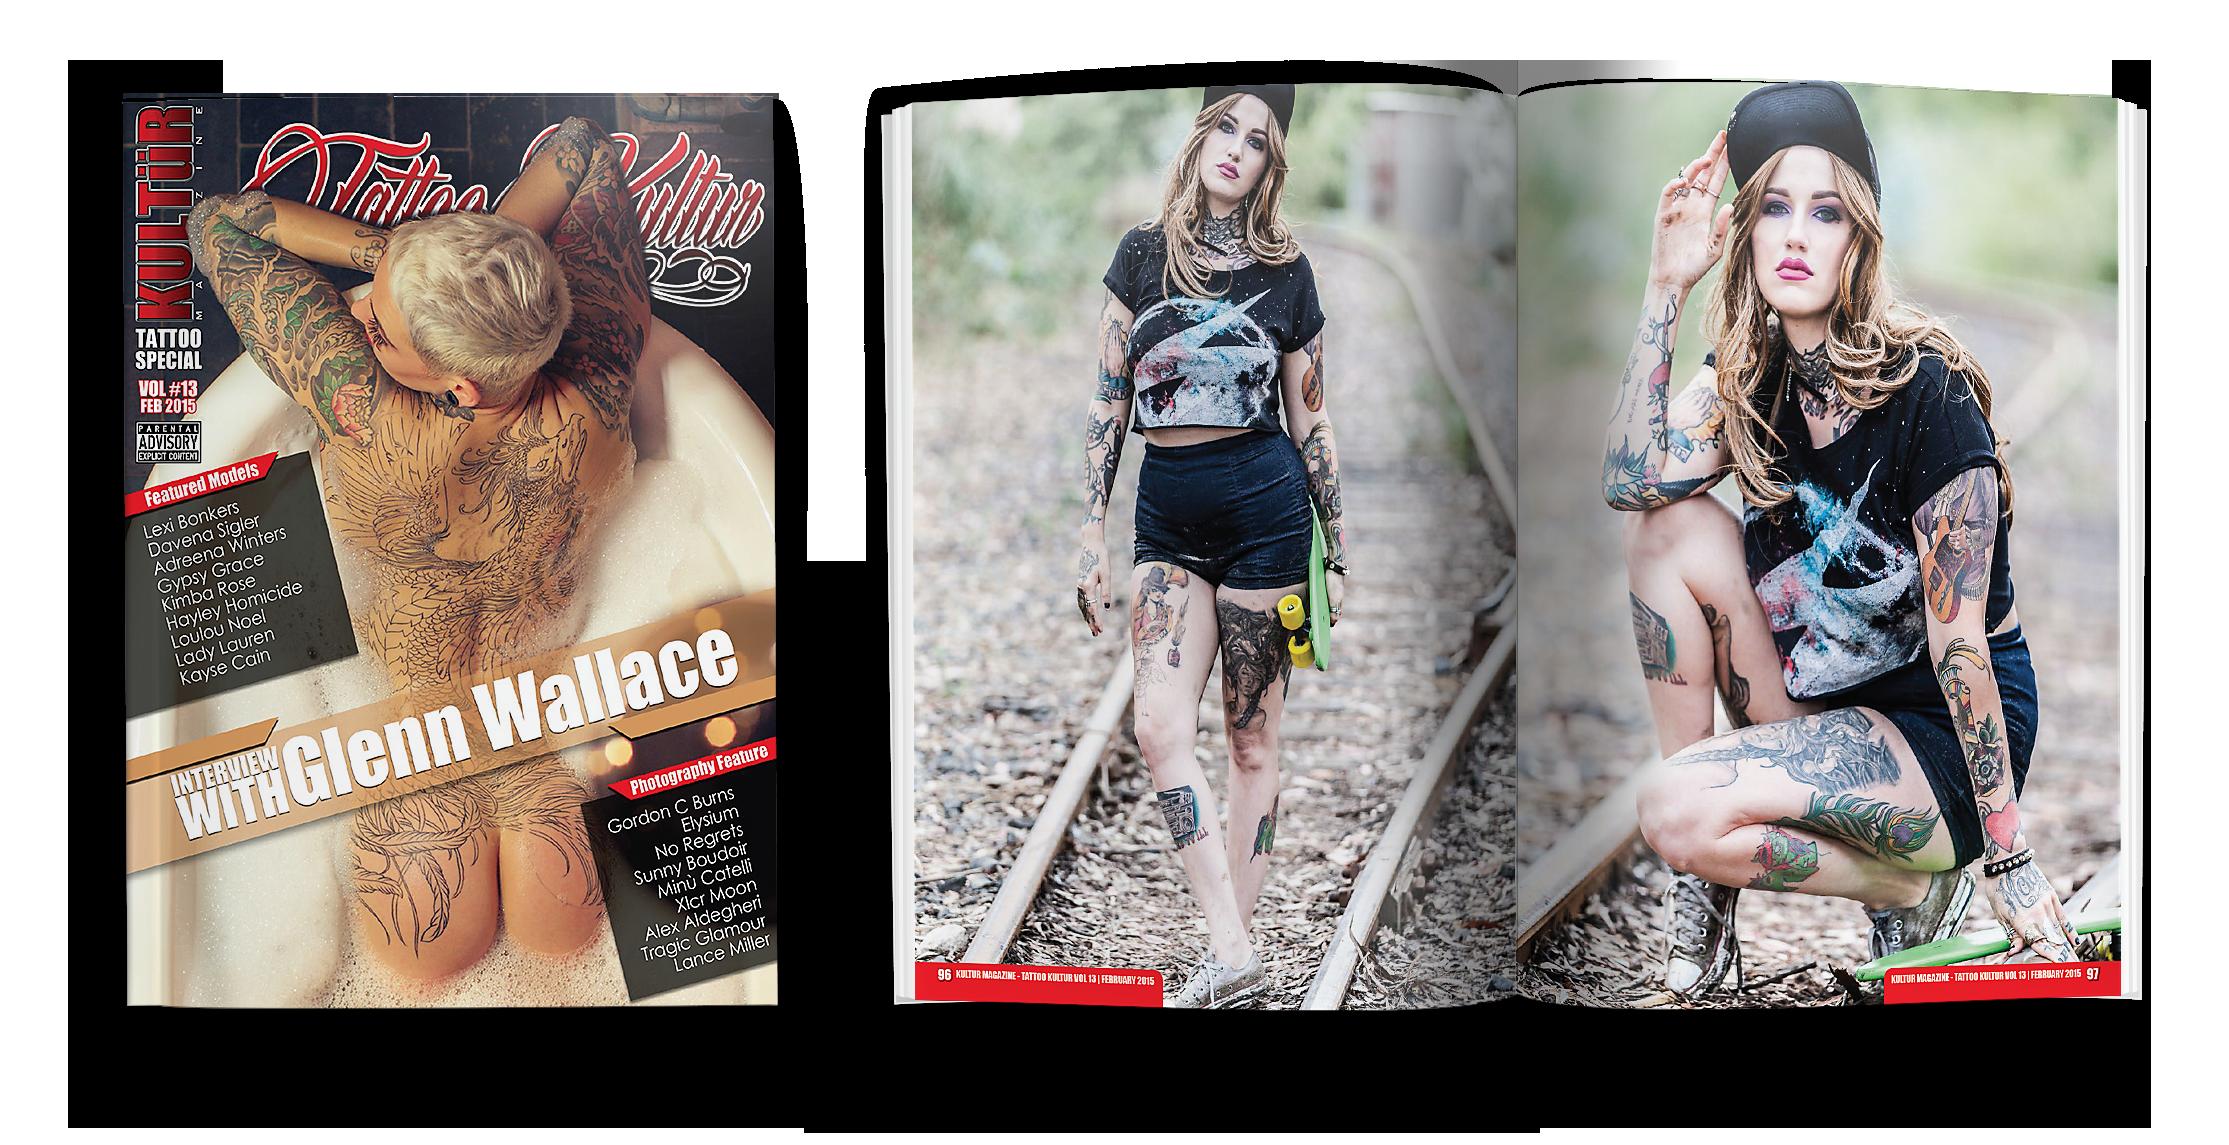 Kultur_Magazine_VOL_13_2_Render6.png